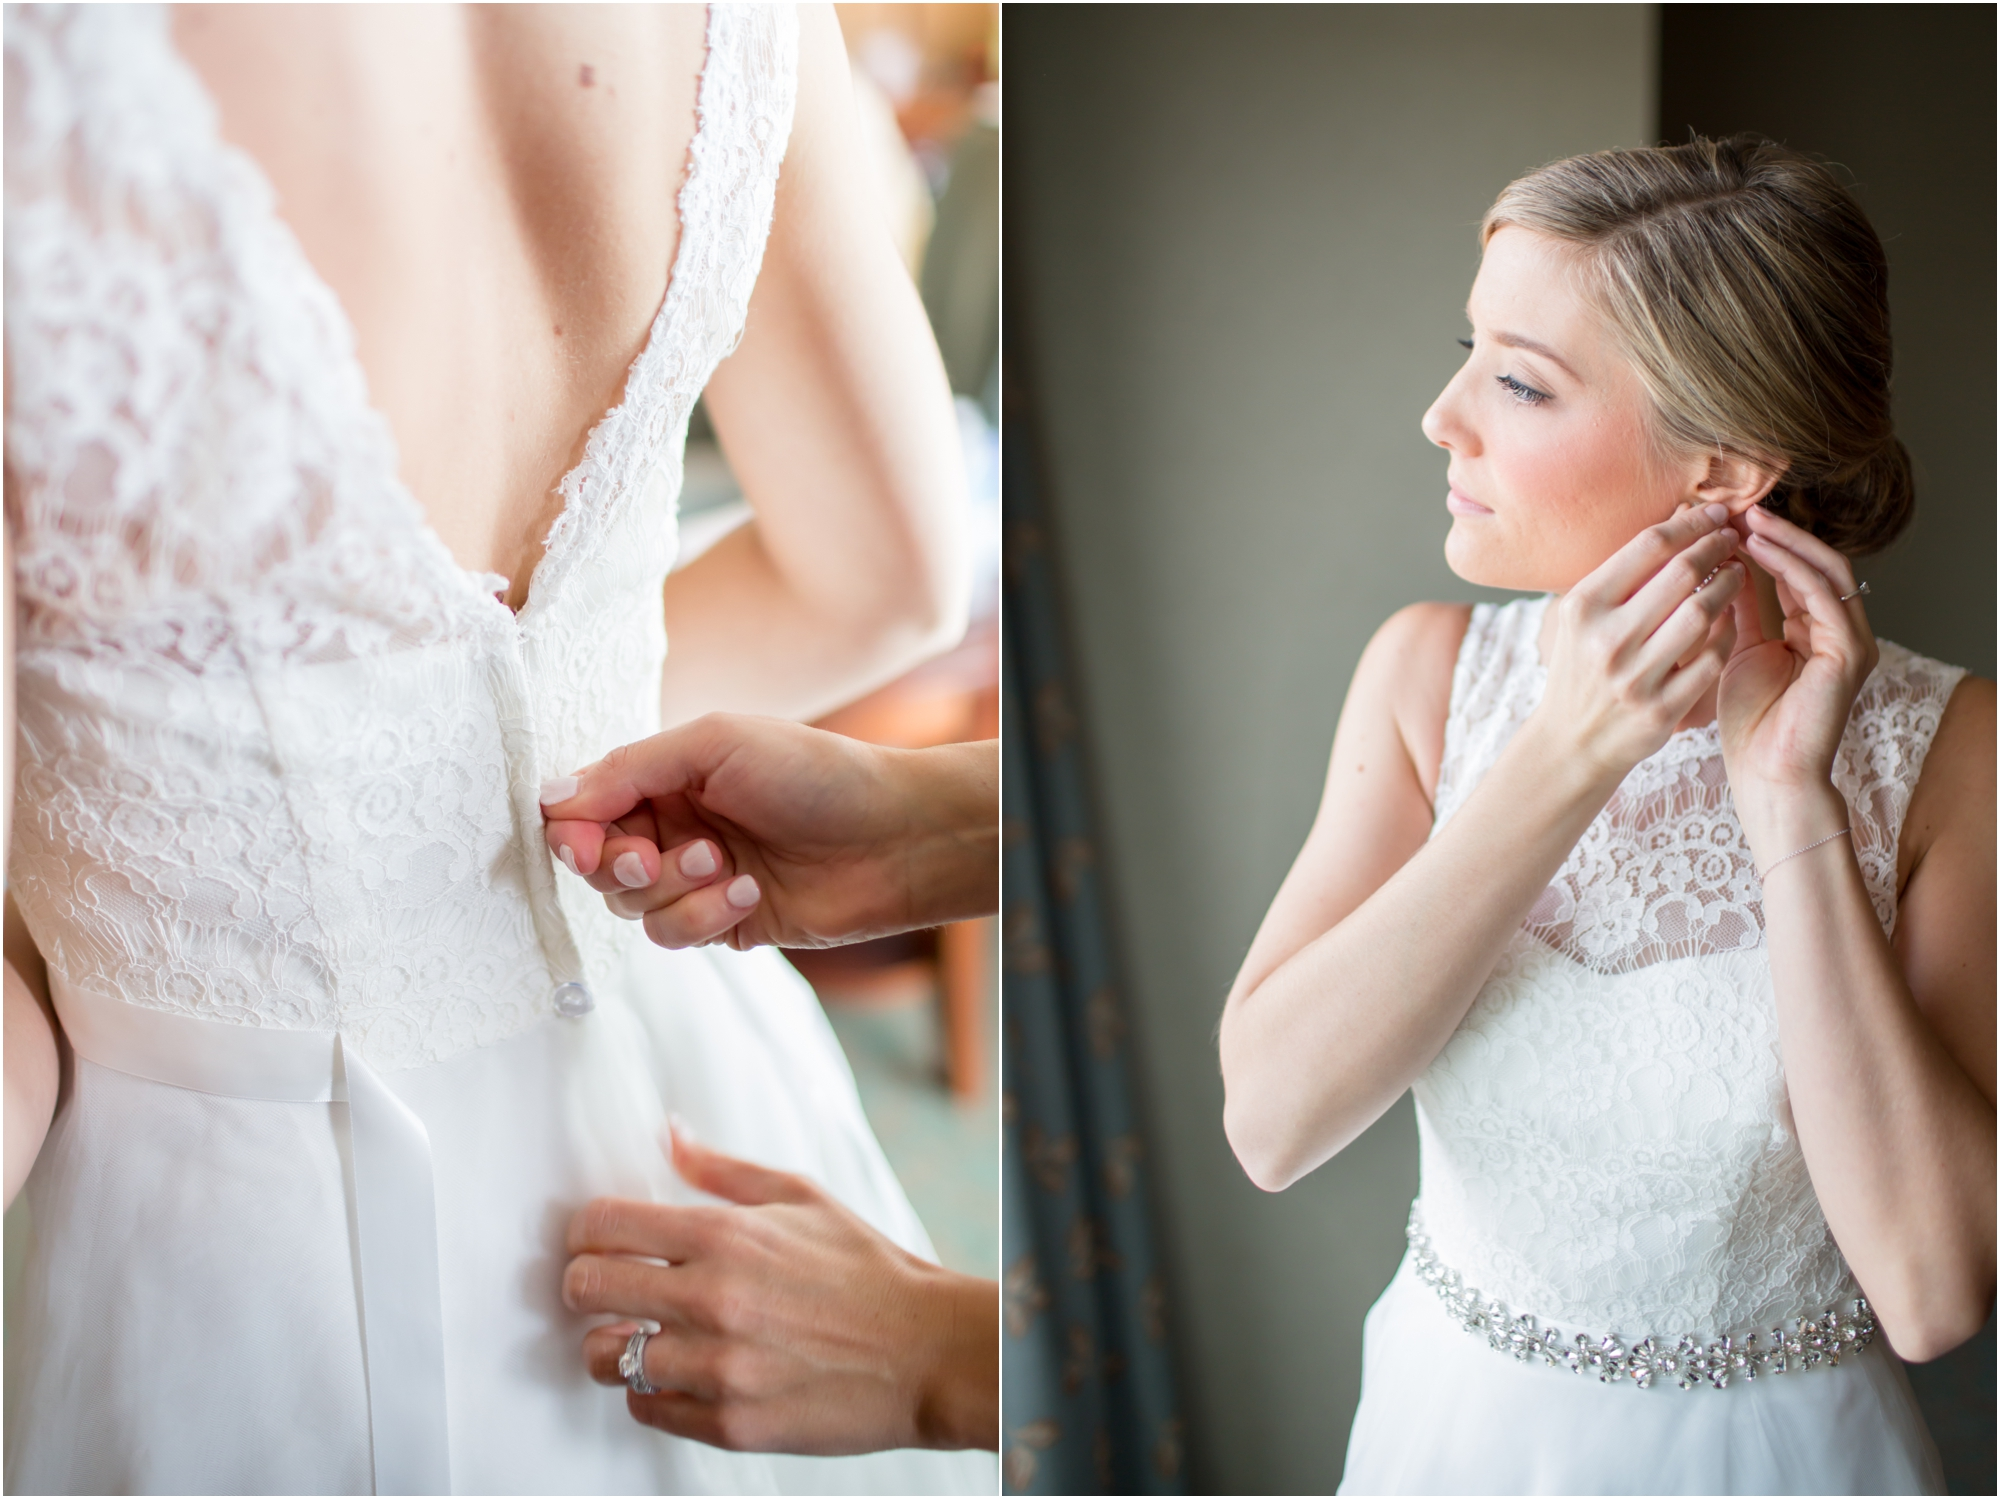 1-Finkel Wedding Getting Ready-112_anna grace photography maryland wedding photographer turf valley.jpg